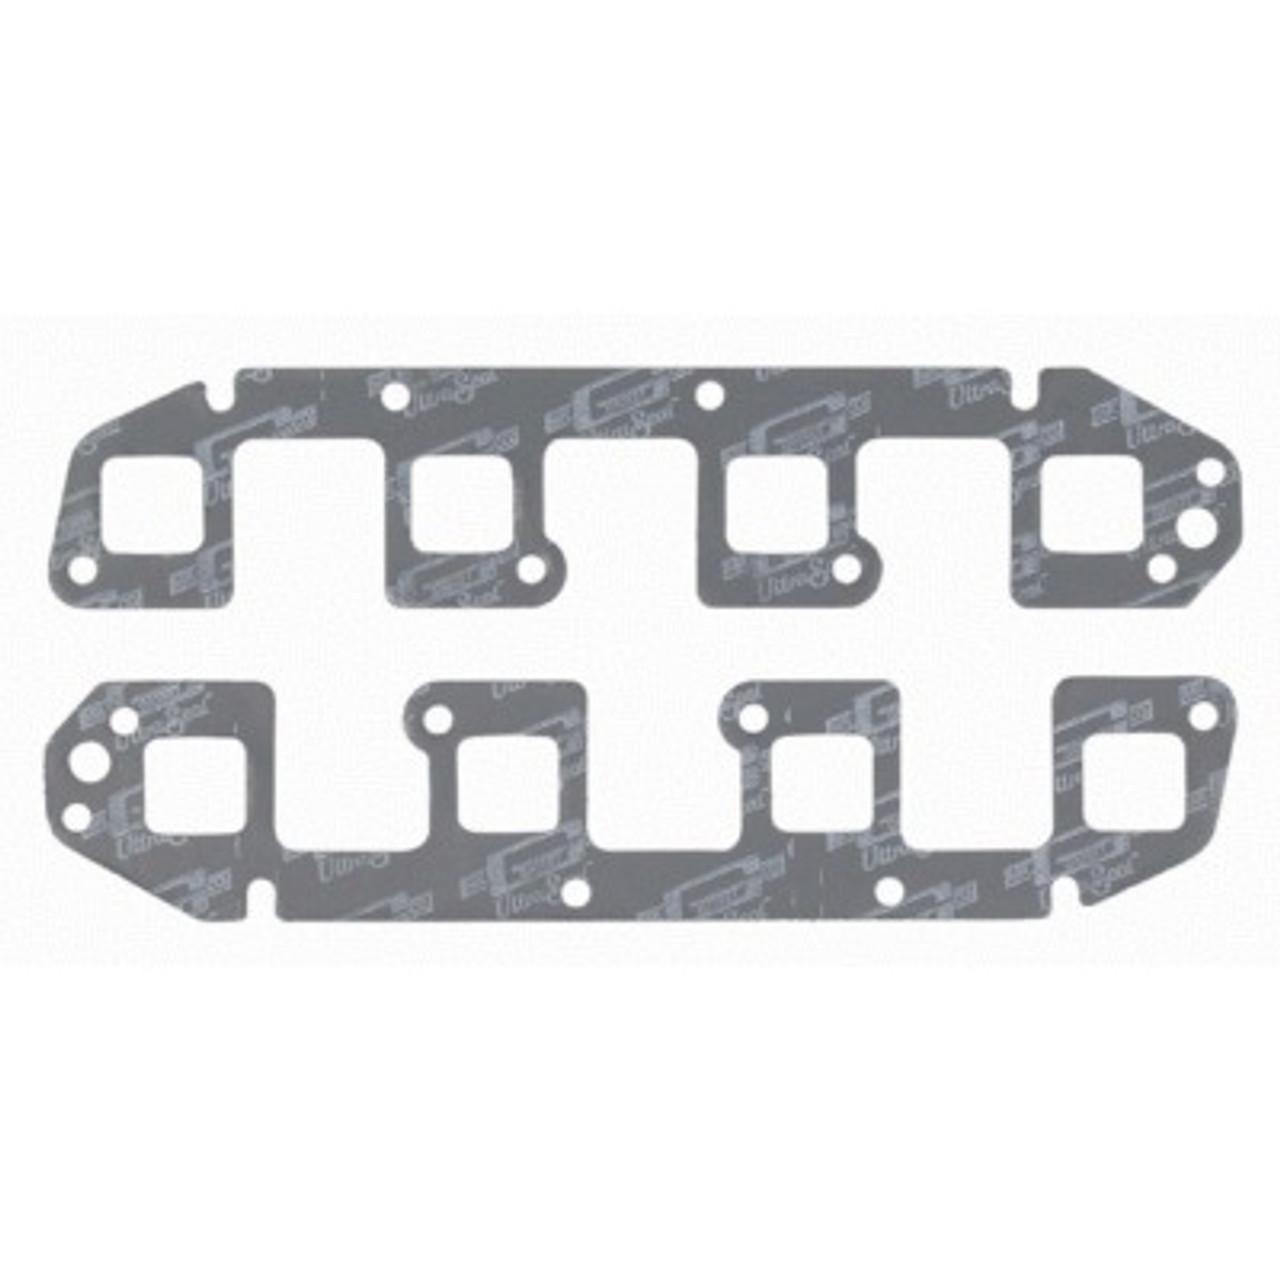 MRG7594, Exhaust Manifold / Header Gasket, Ultra-Seal, 1.450 x 1.470 in Rectangle Port, Steel Core Laminate, Mopar Gen III Hemi, Pair